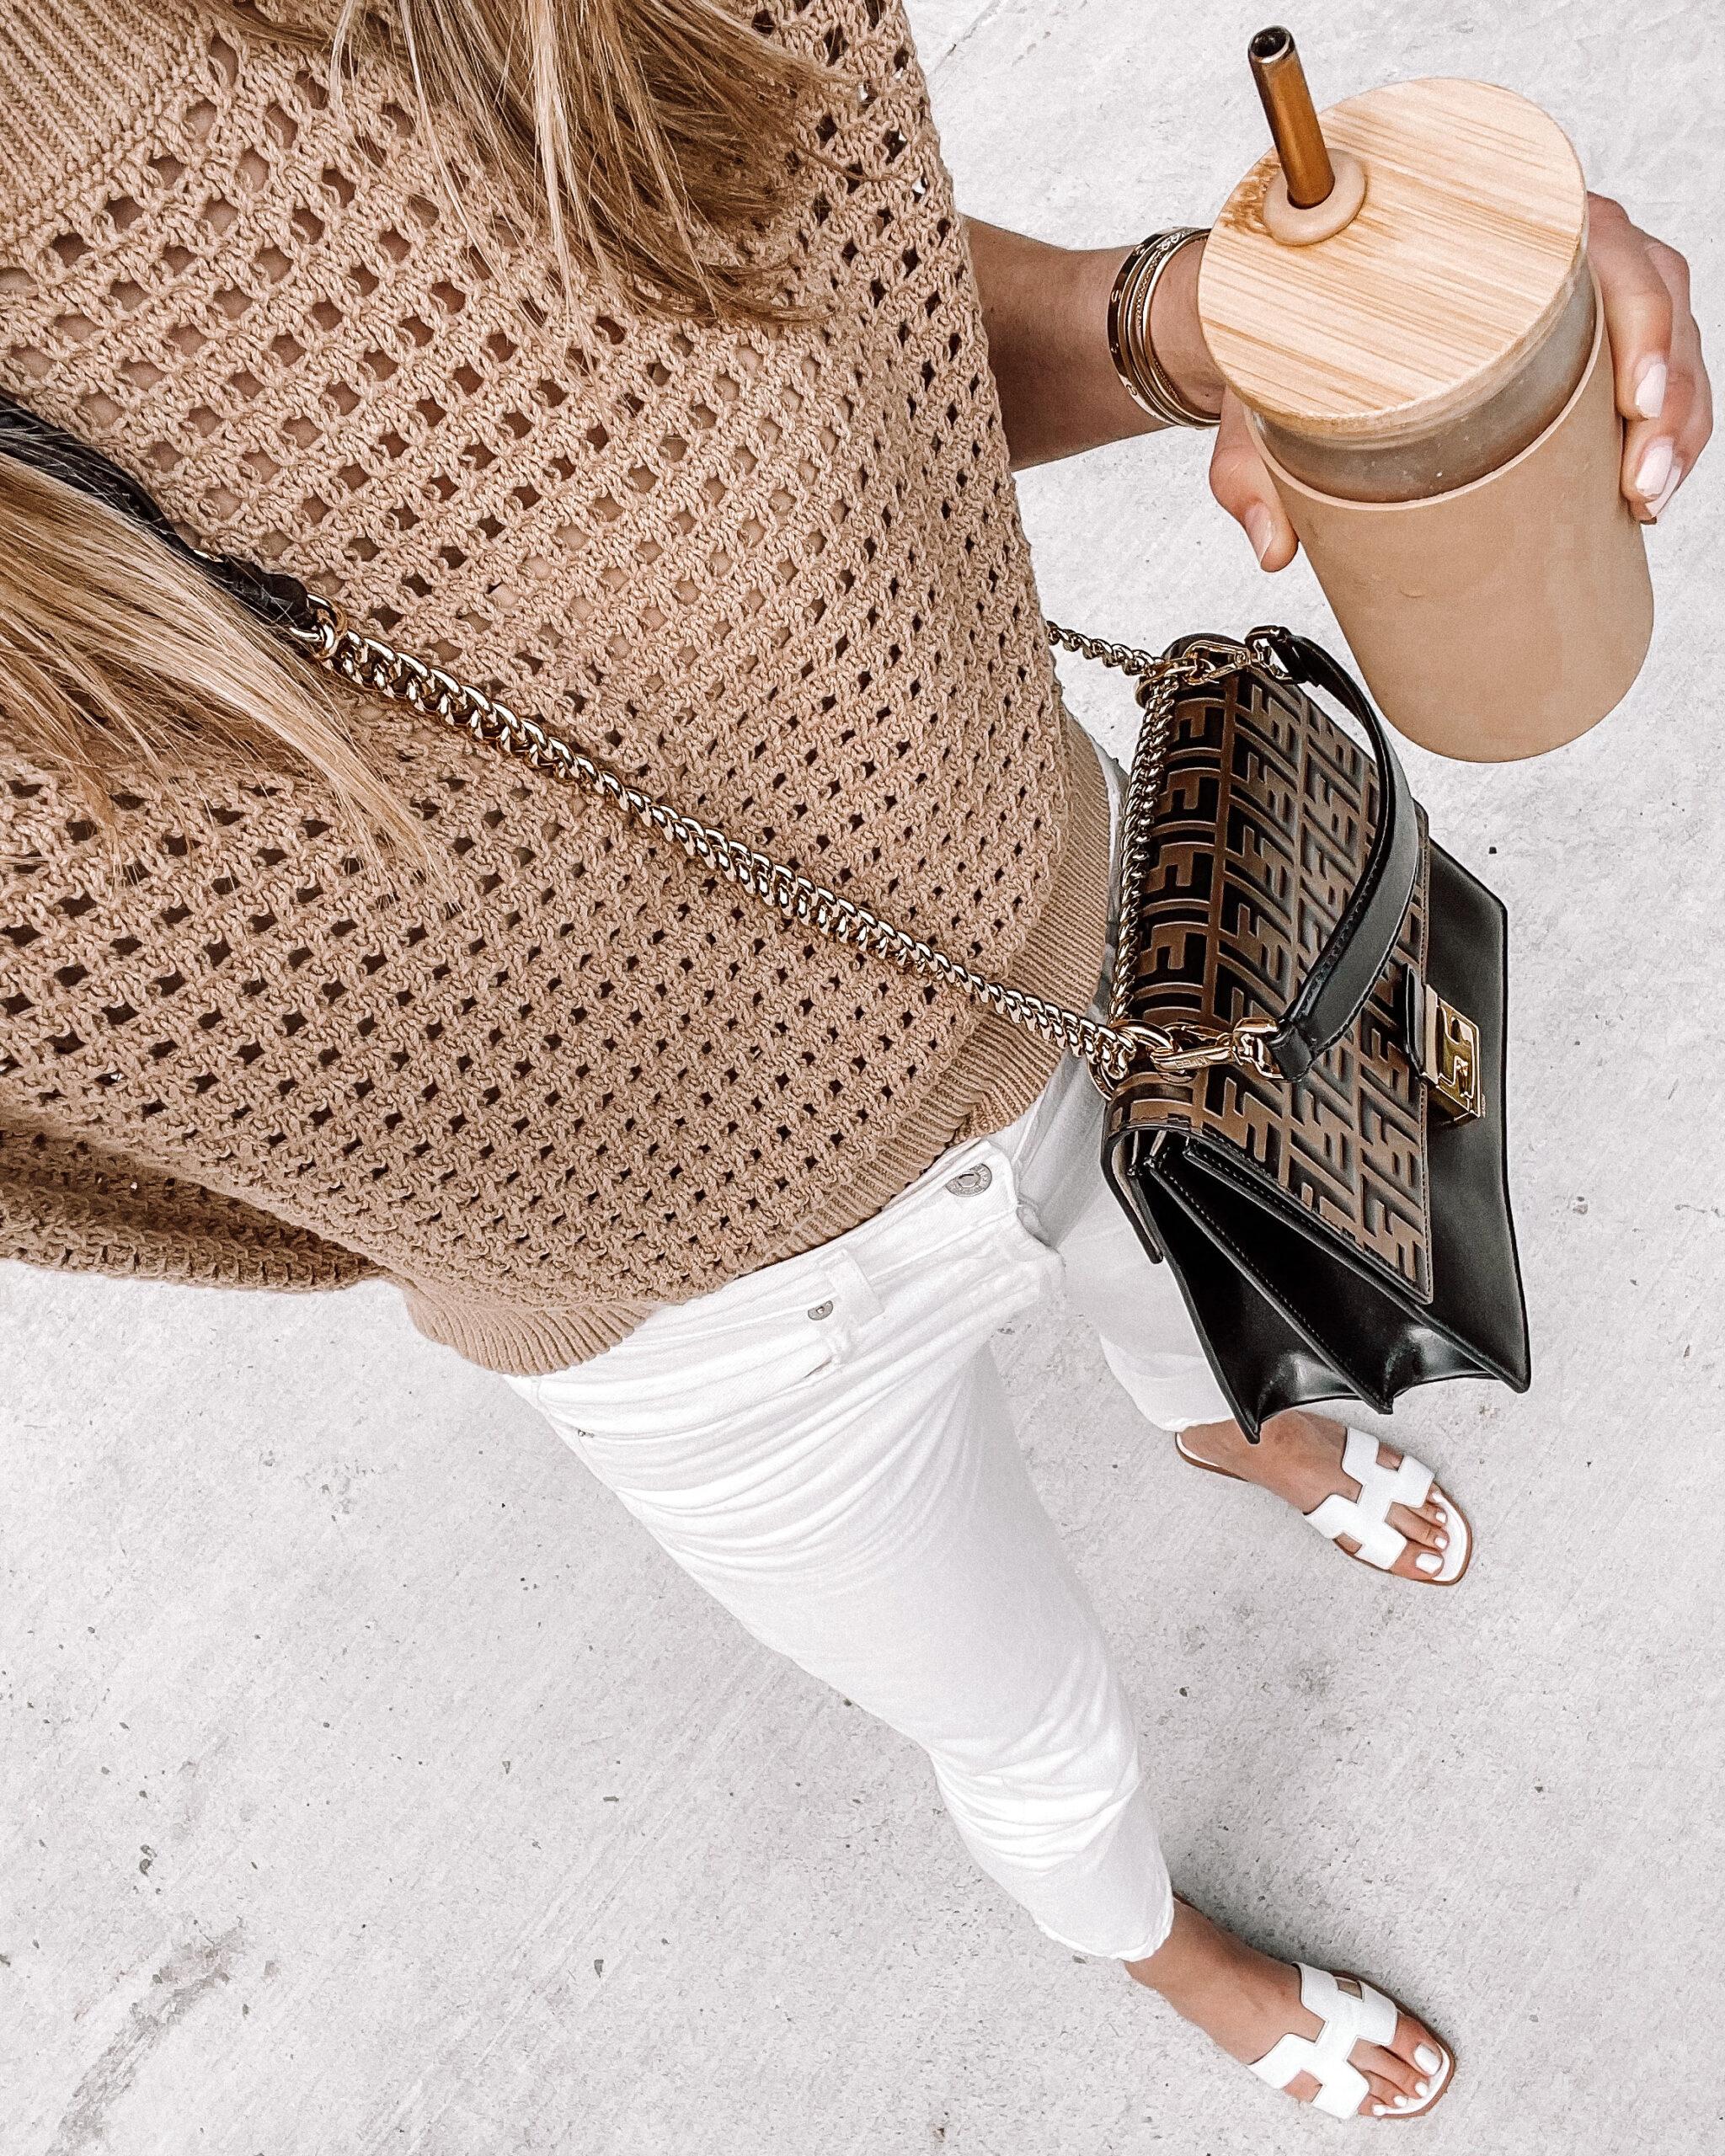 Fashion Jackson Wearing Tan Crochet Short Sleeve Sweater White Jeans White Hermes Sandals Fendi Handbag